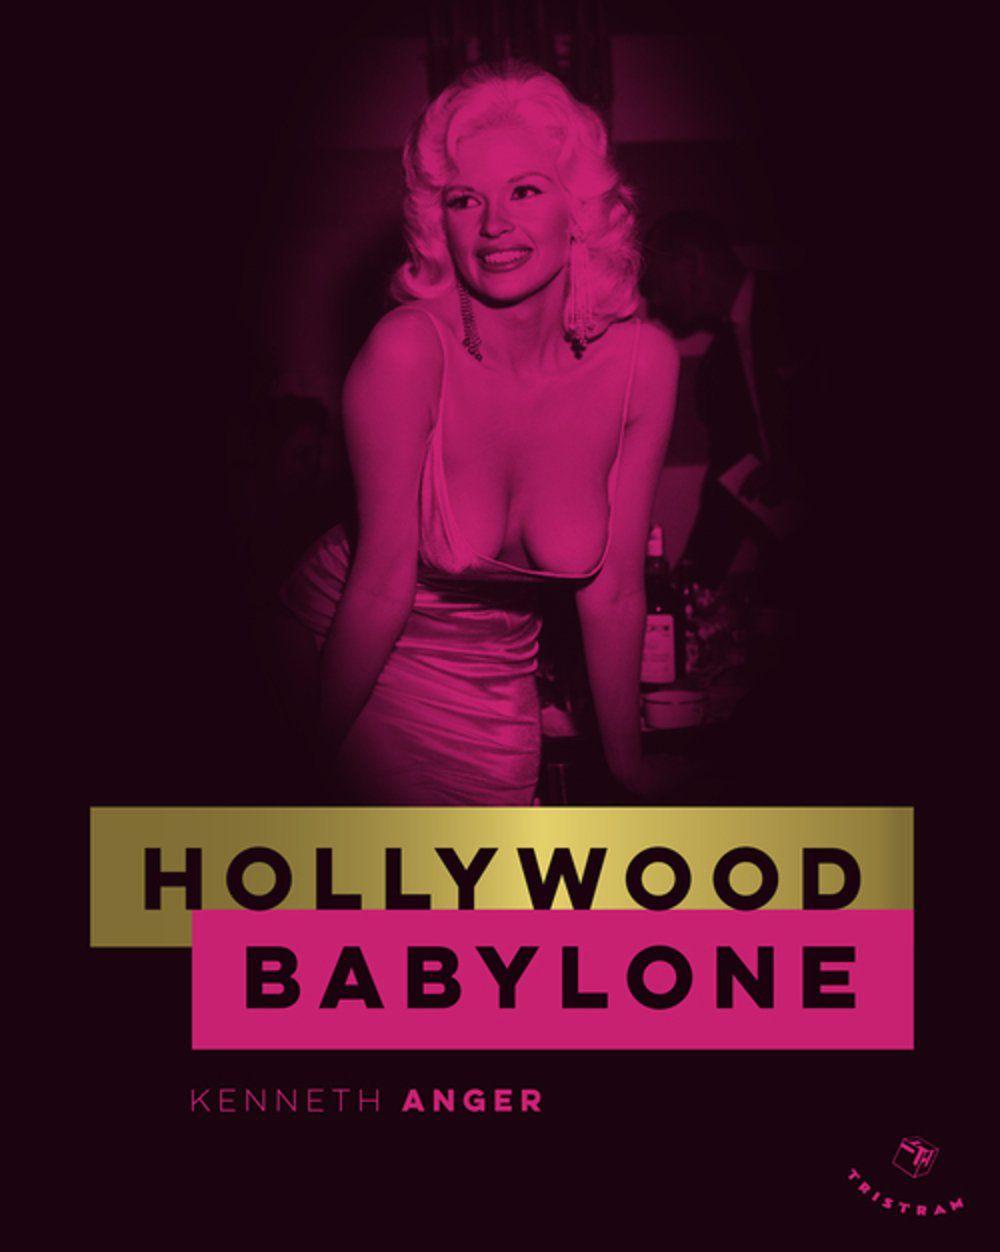 Hollywood babylon, from Ken Anger